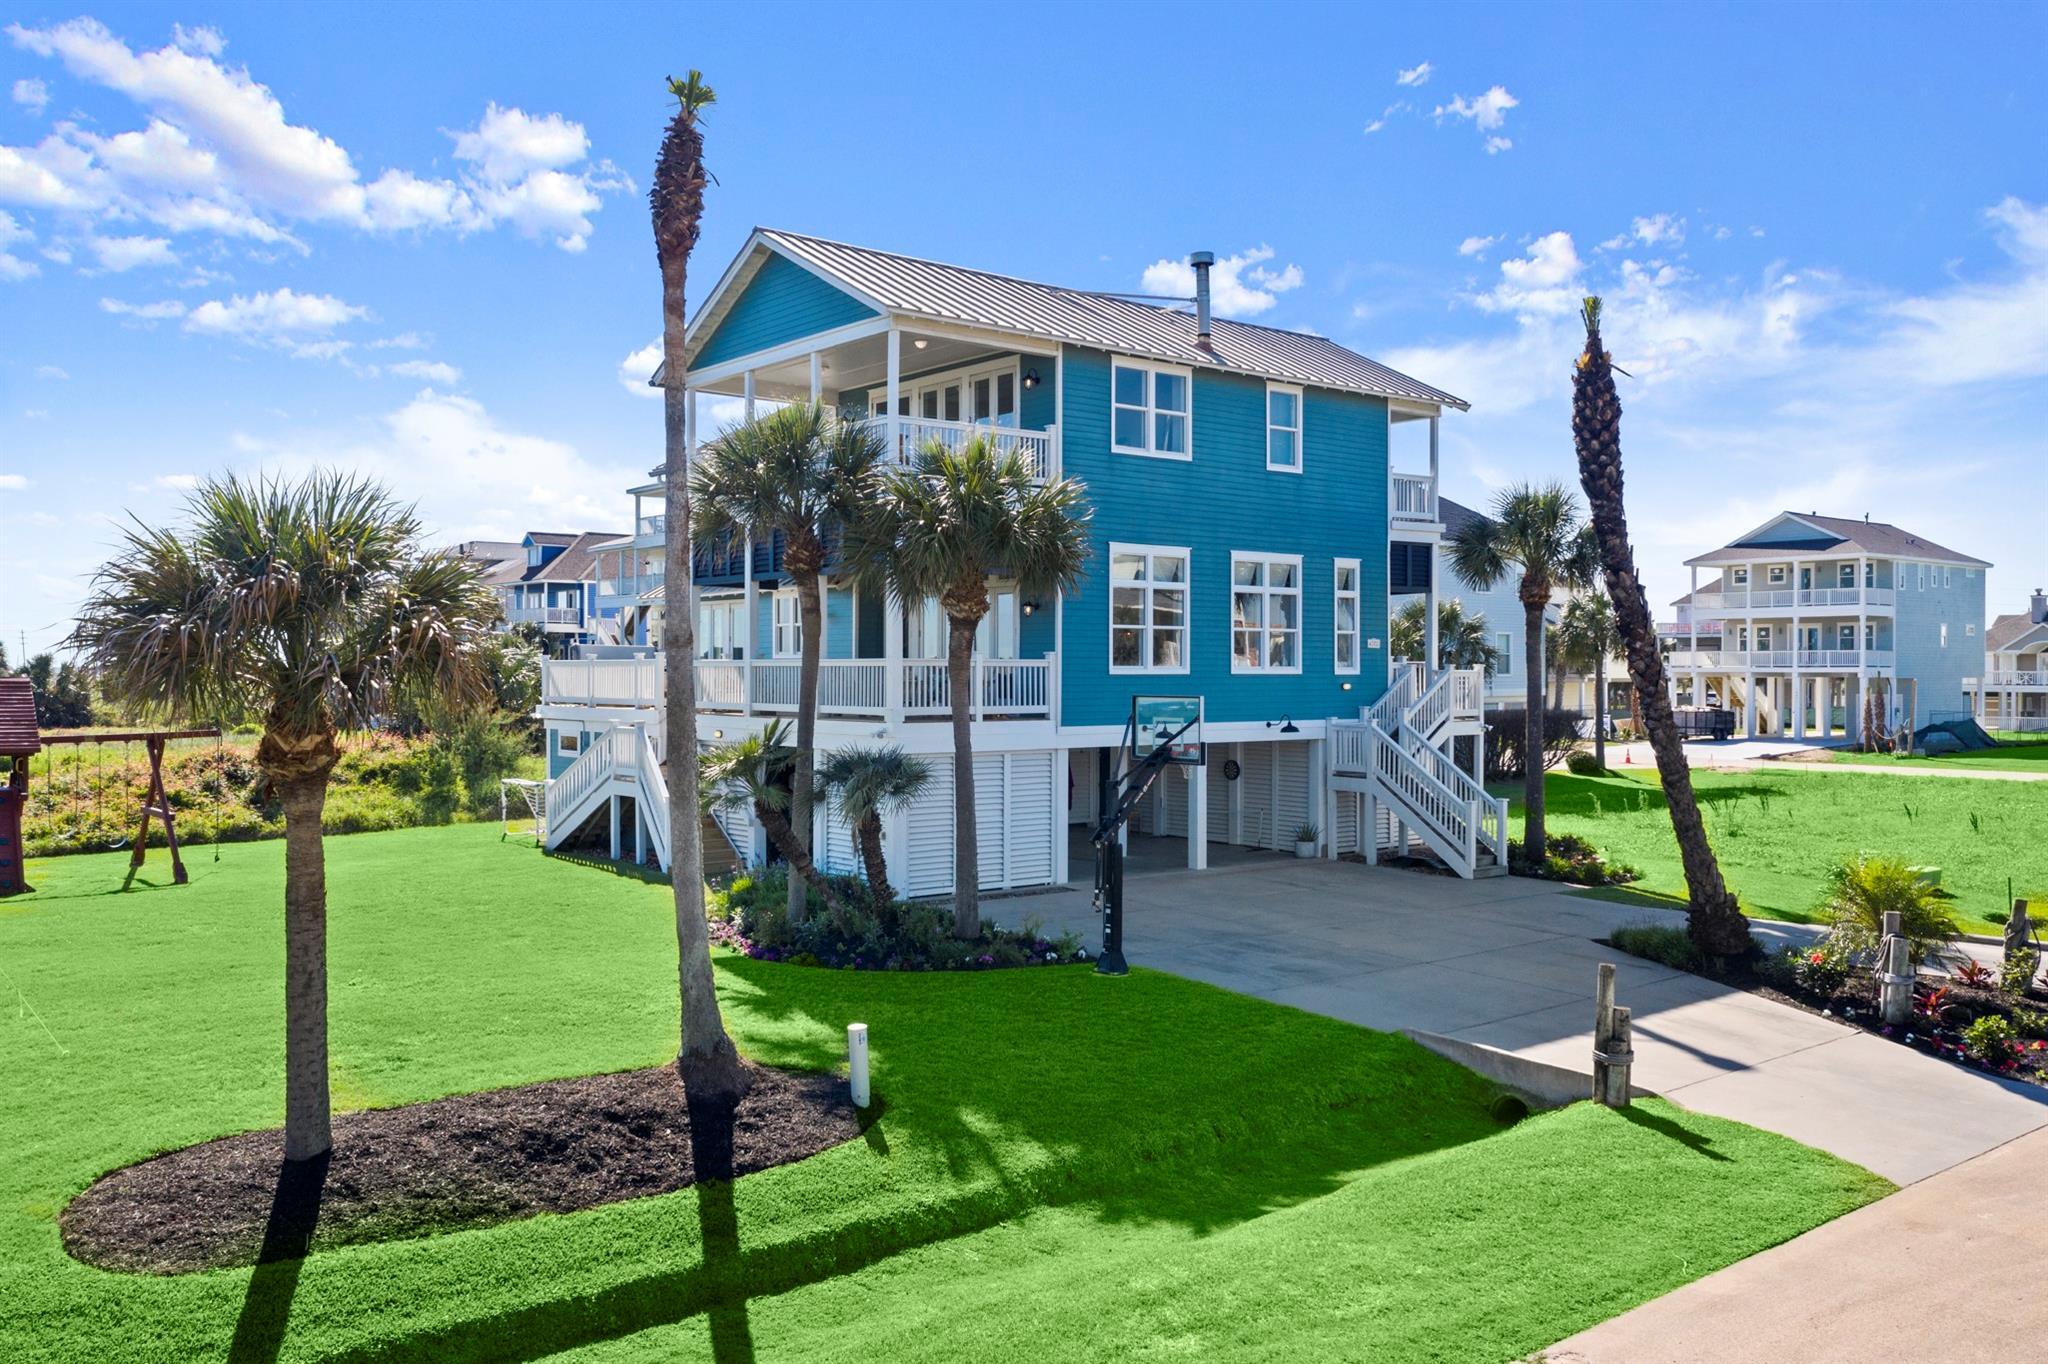 4202 Swashbuckle Property Photo - Galveston, TX real estate listing